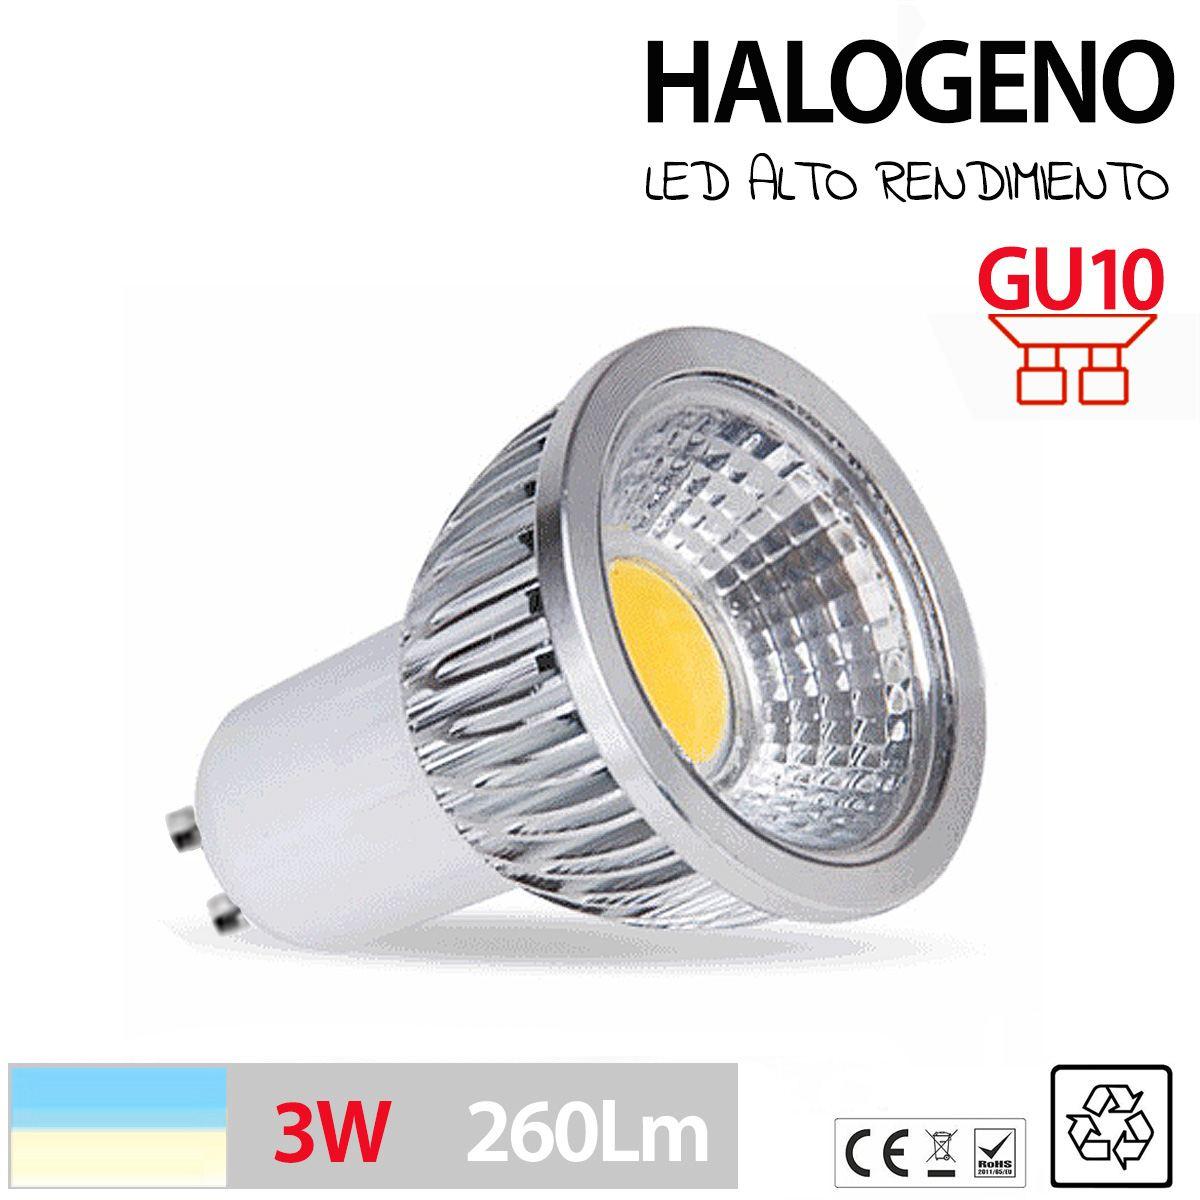 Halogeno led gu10 bombilla lampara foco 3w 5w 7w maximo - Foco halogeno led ...